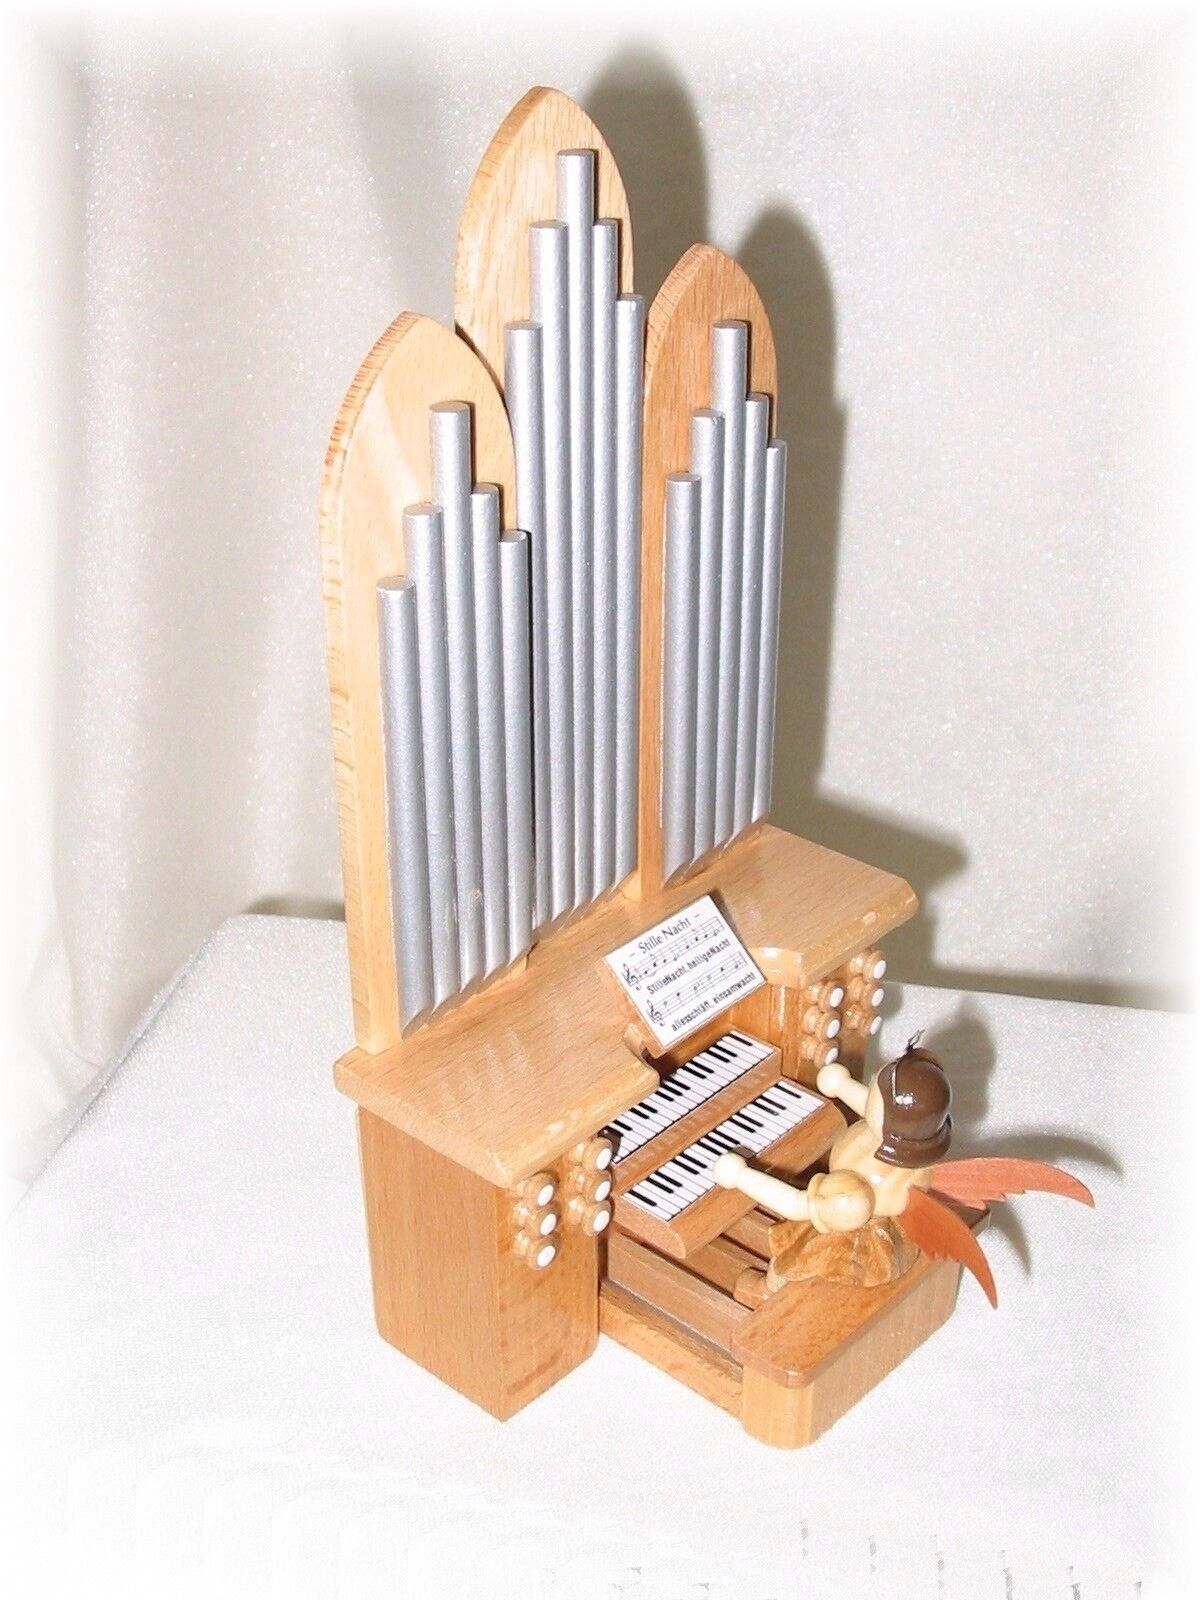 Blank anges M. à l'orgue M. anges Spielwerk-Nature kurzrockengel aa0265